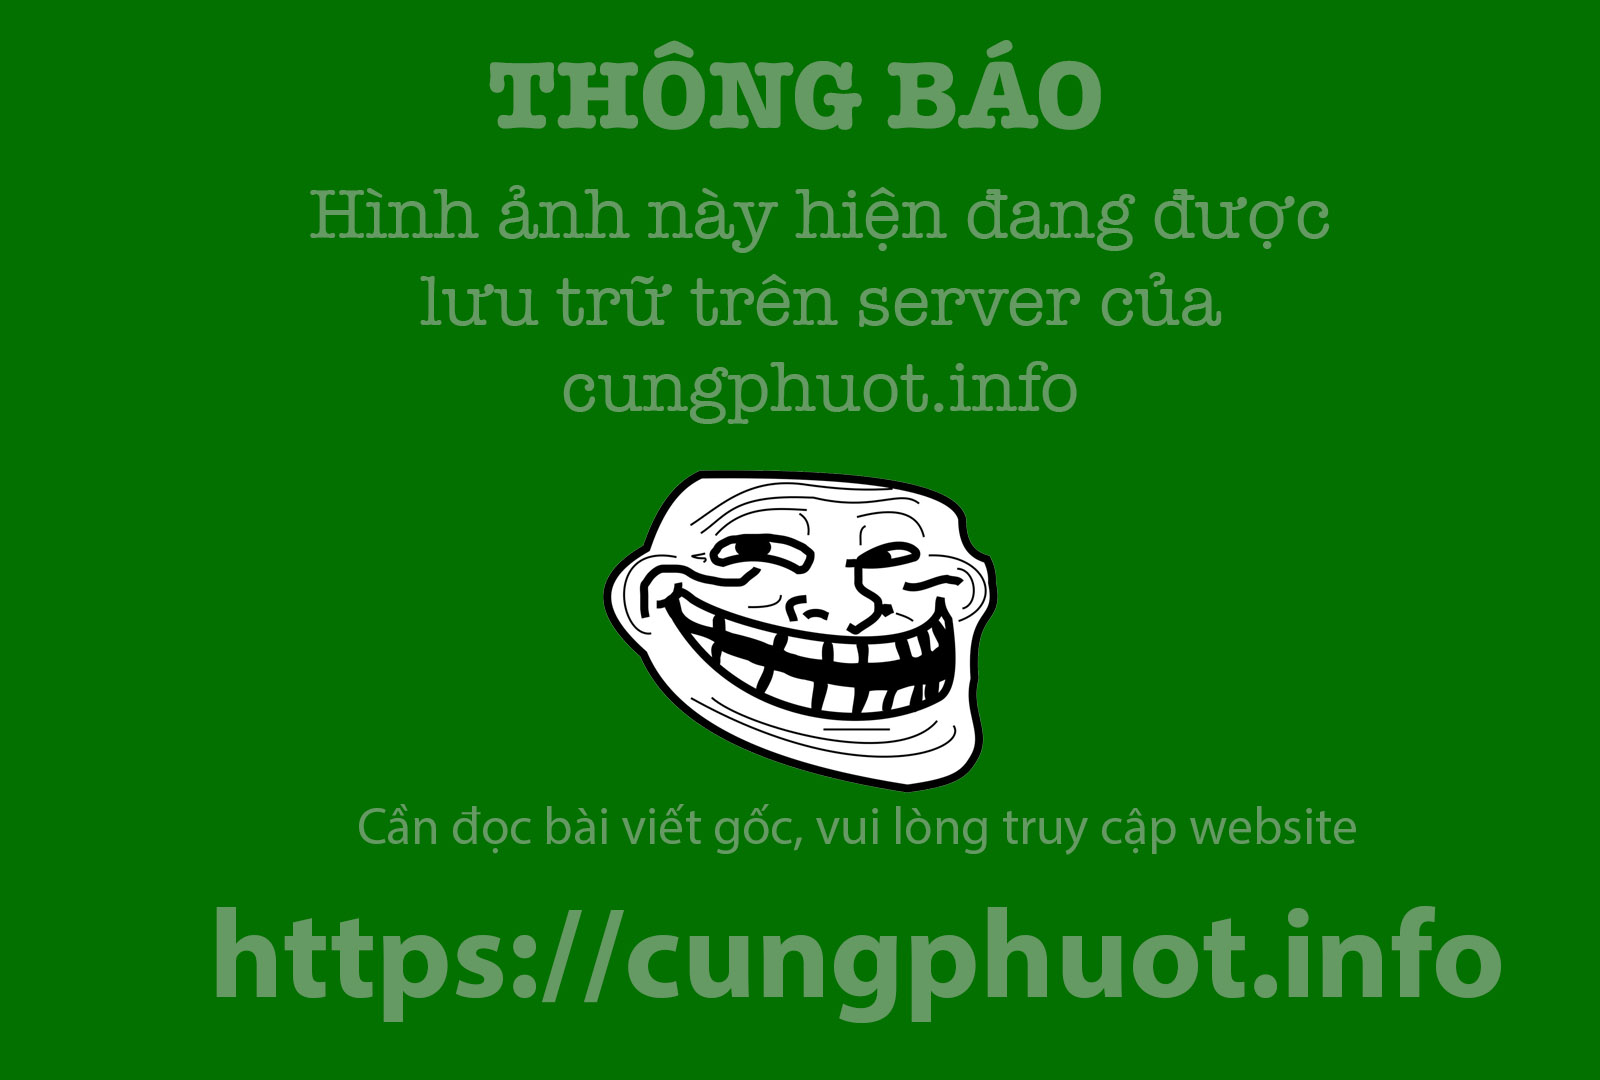 Dan phuot me man ve dep ky vi cua hang Prai o Quang Tri hinh anh 7